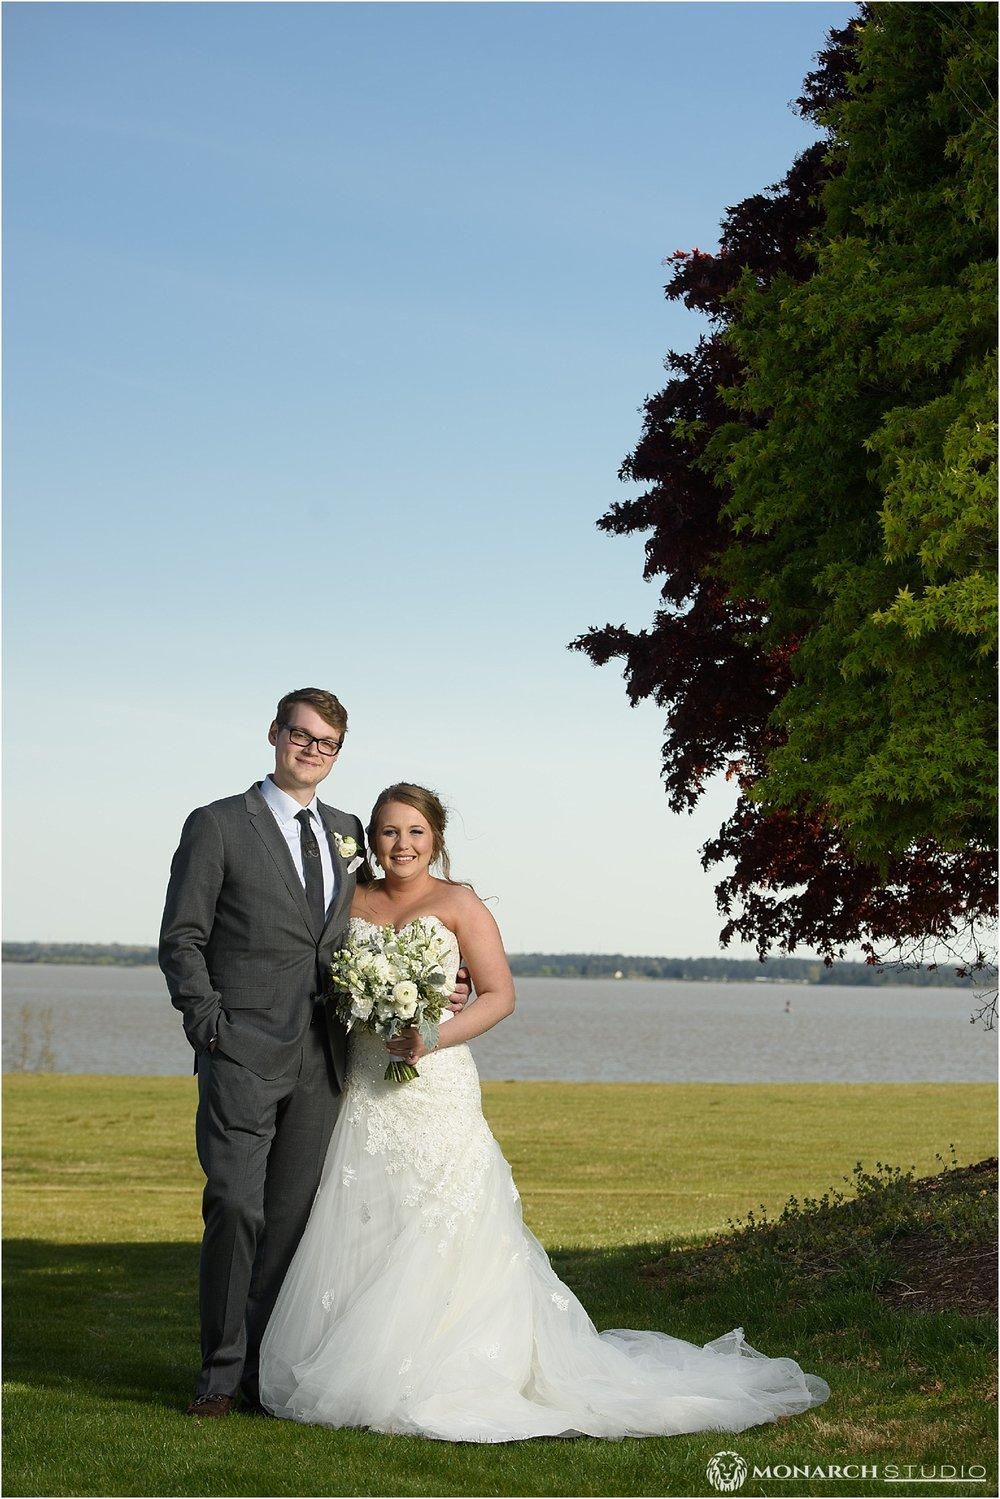 williamsburg-virginia-wedding-photographer-068.jpg